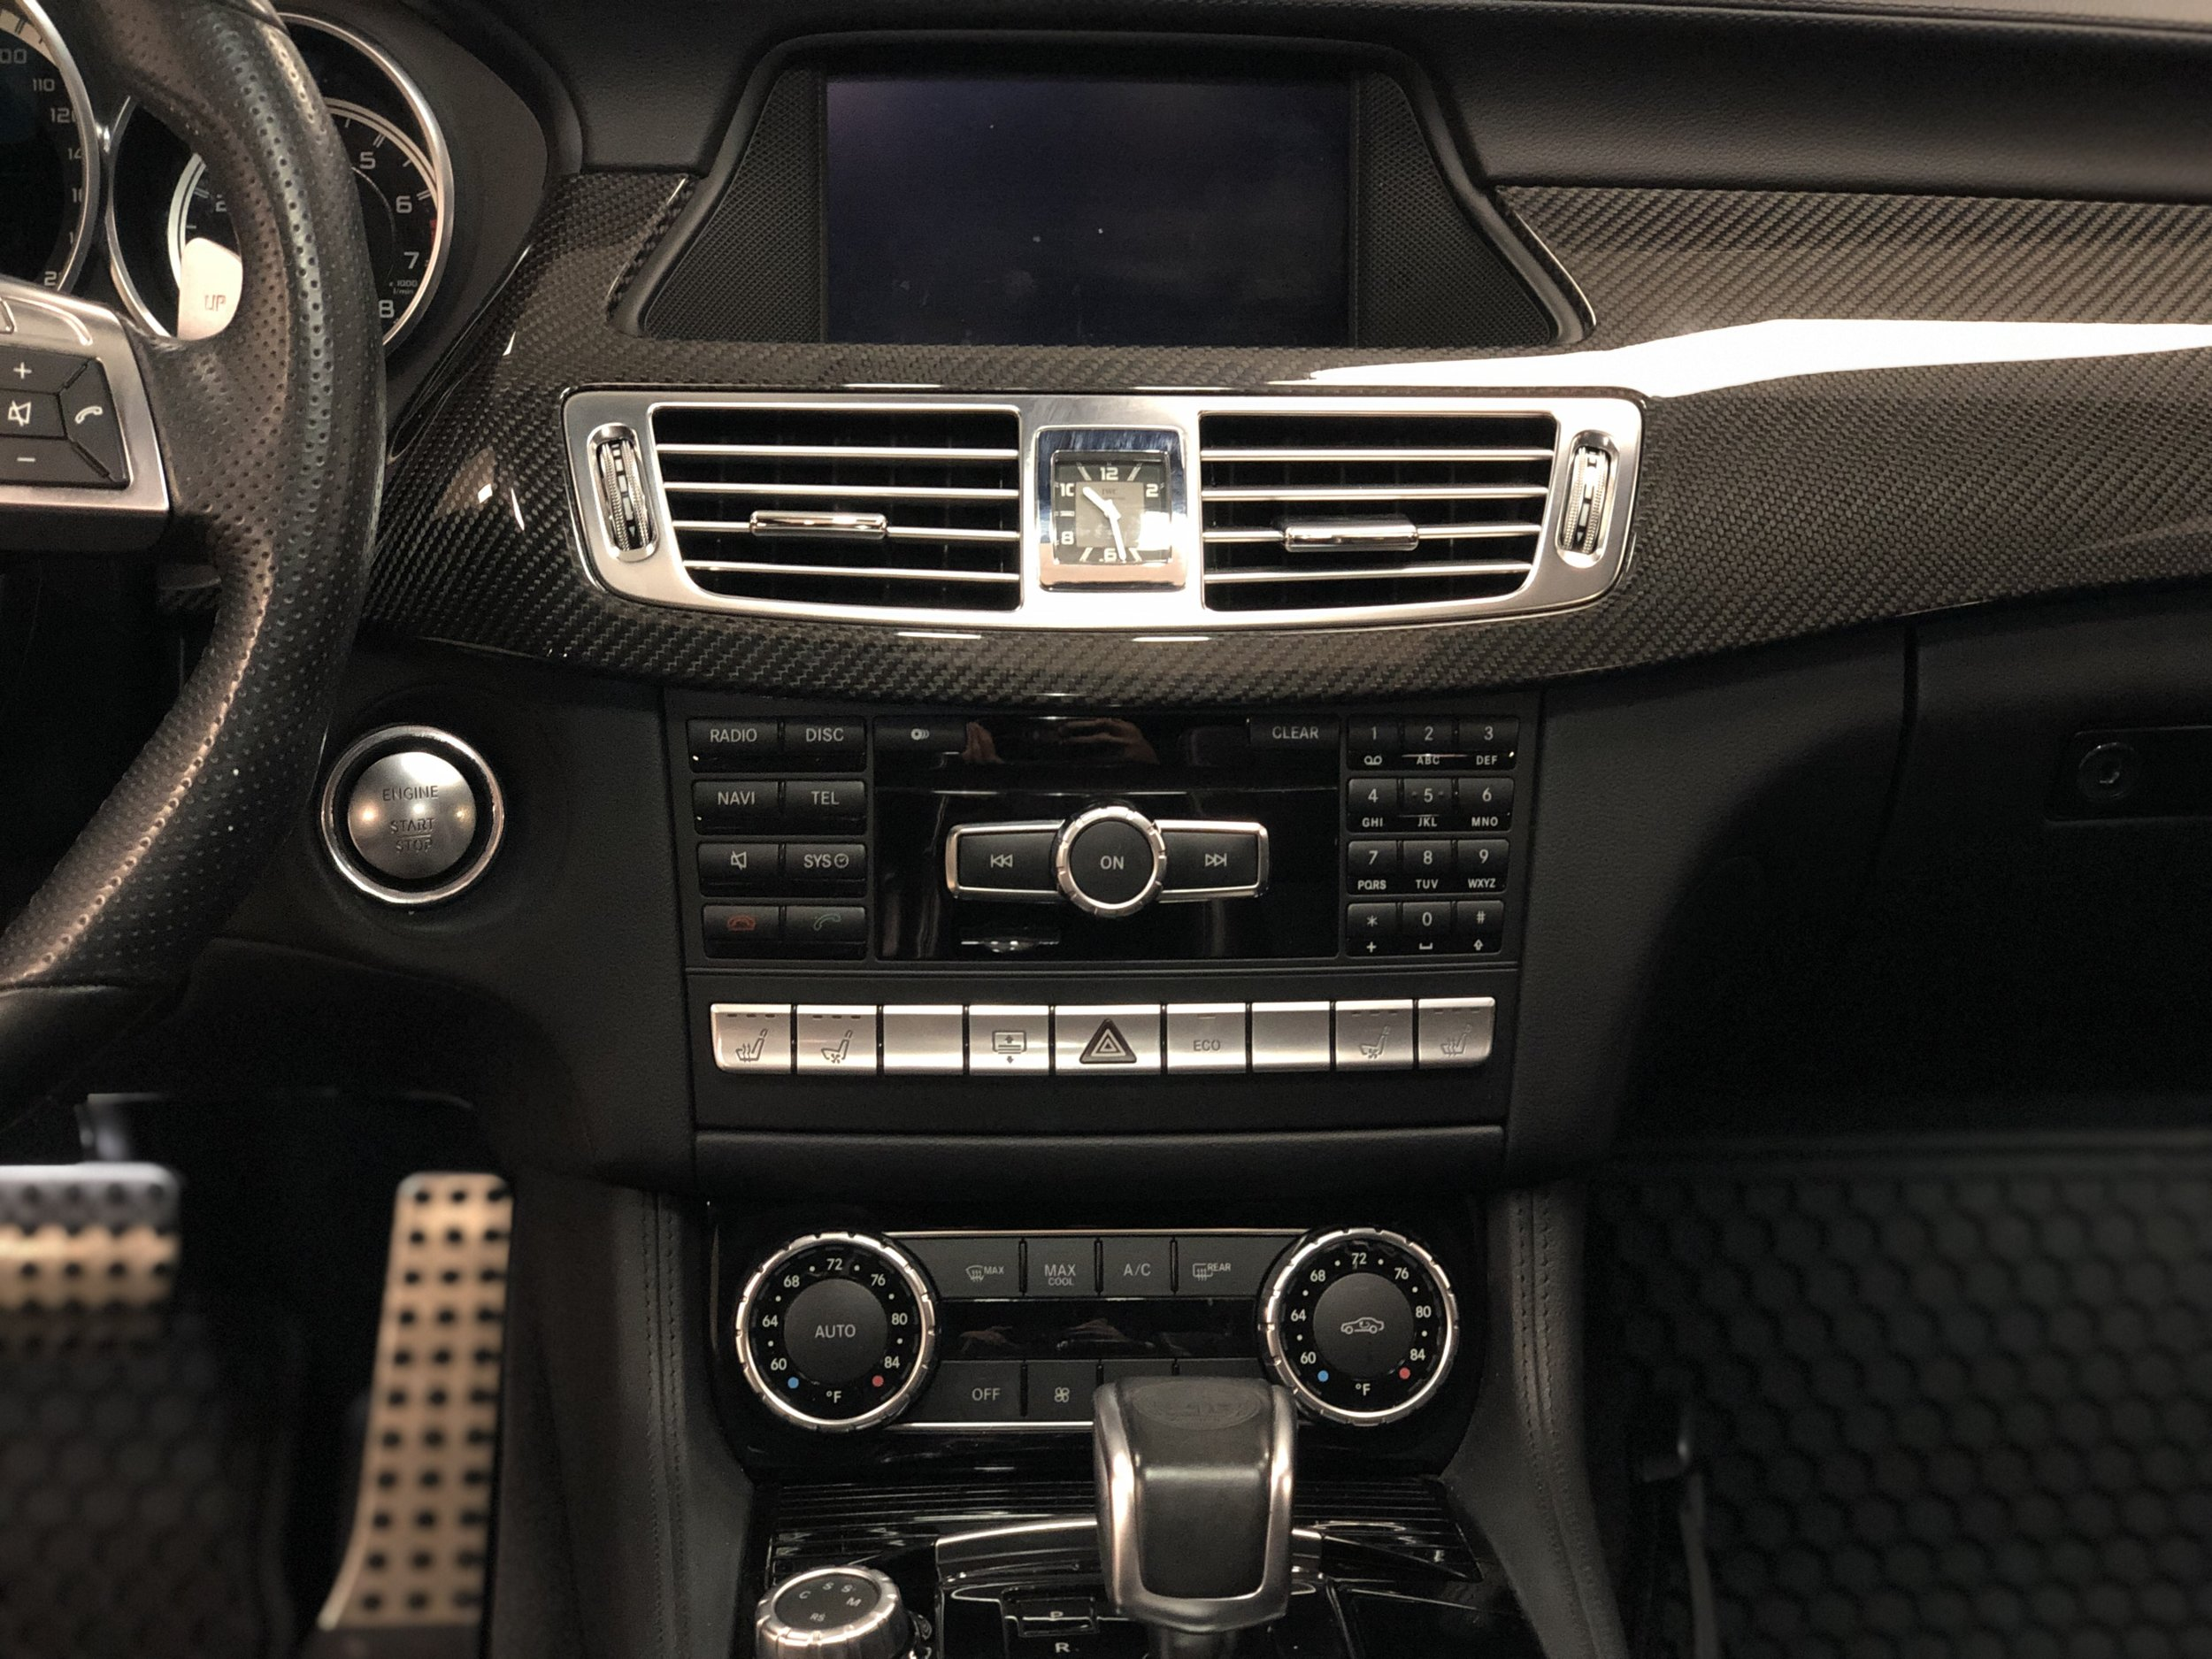 2012 Mercedes-Benz CLS 63 RENNTECH Front Interior